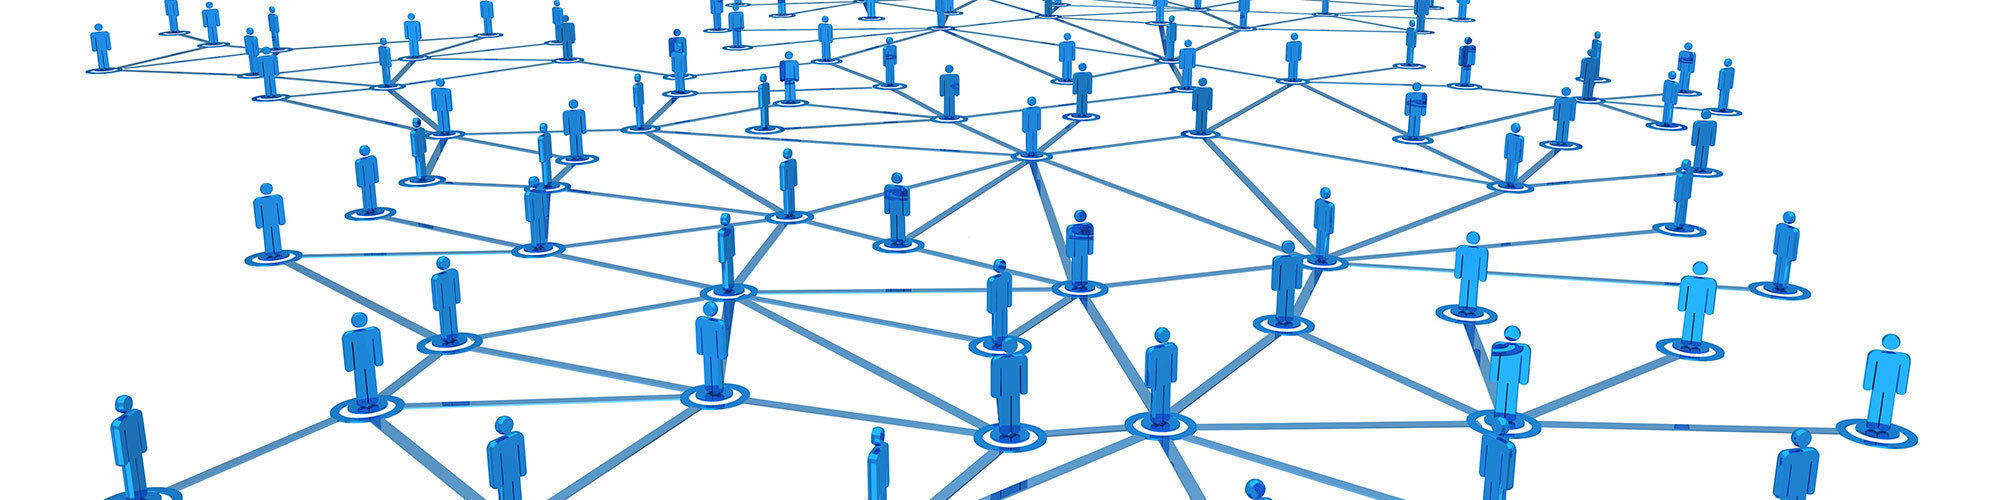 Netwerk header